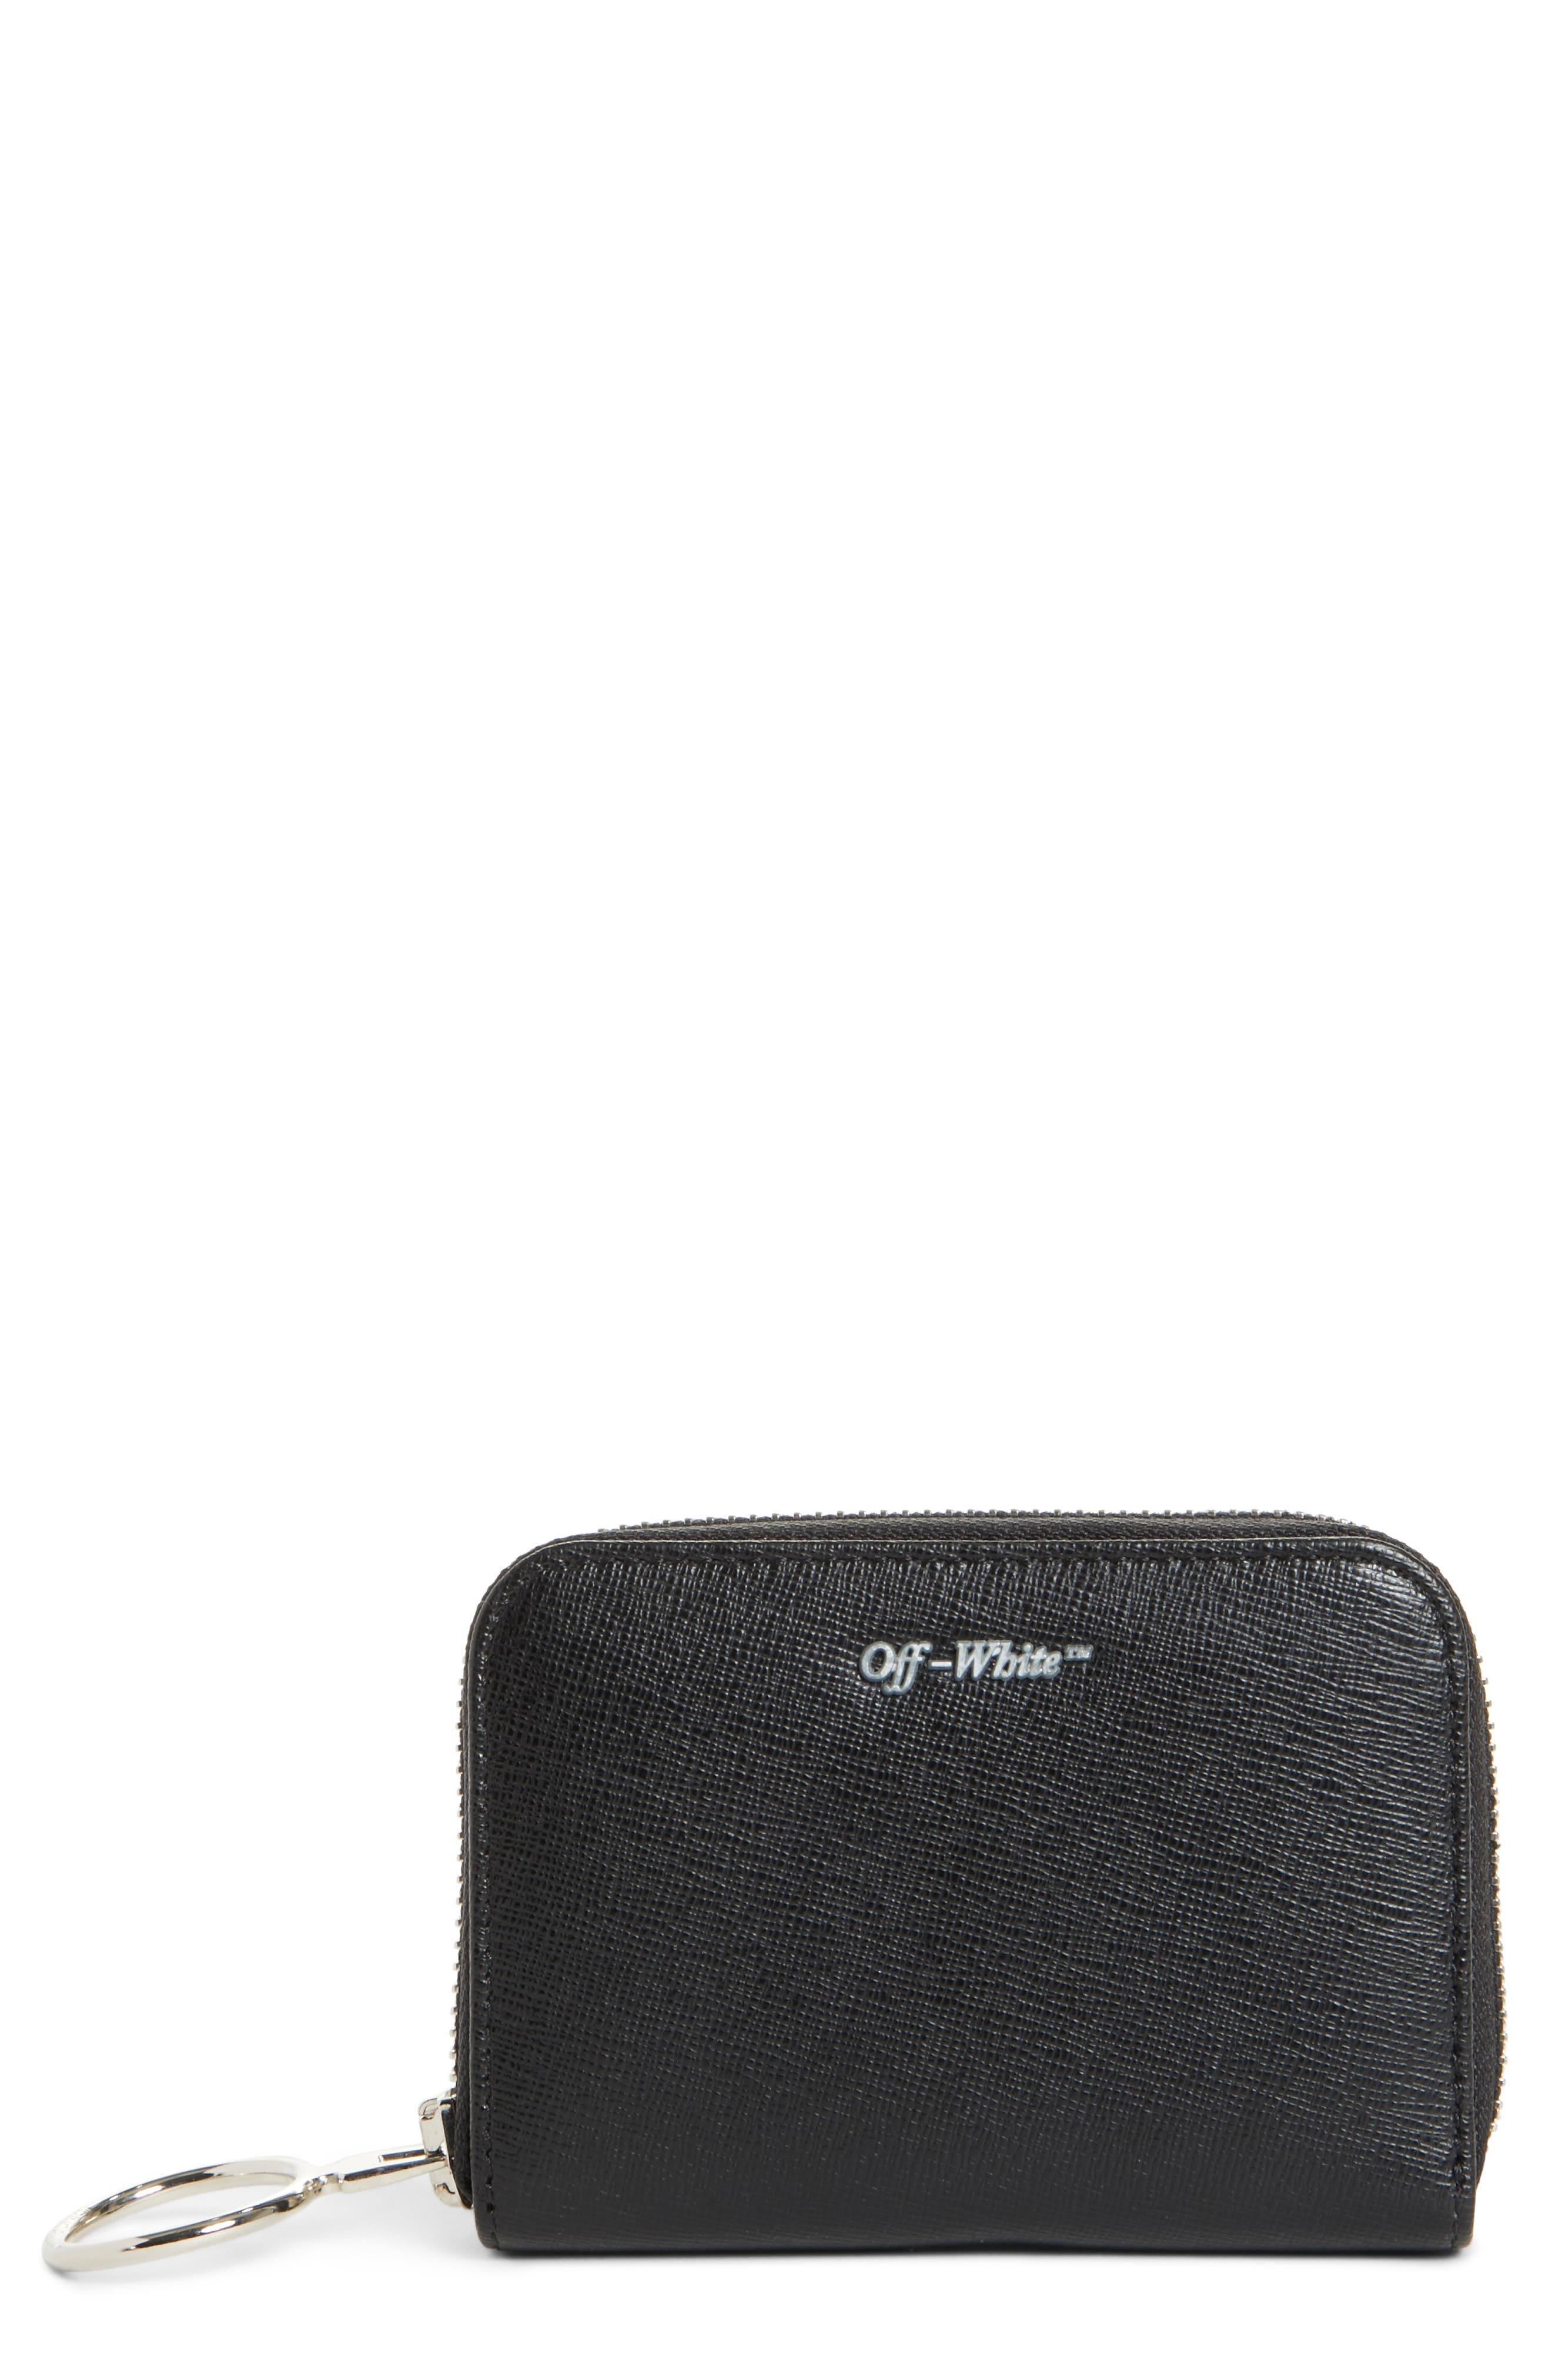 Medium Zip Wallet,                             Main thumbnail 1, color,                             001